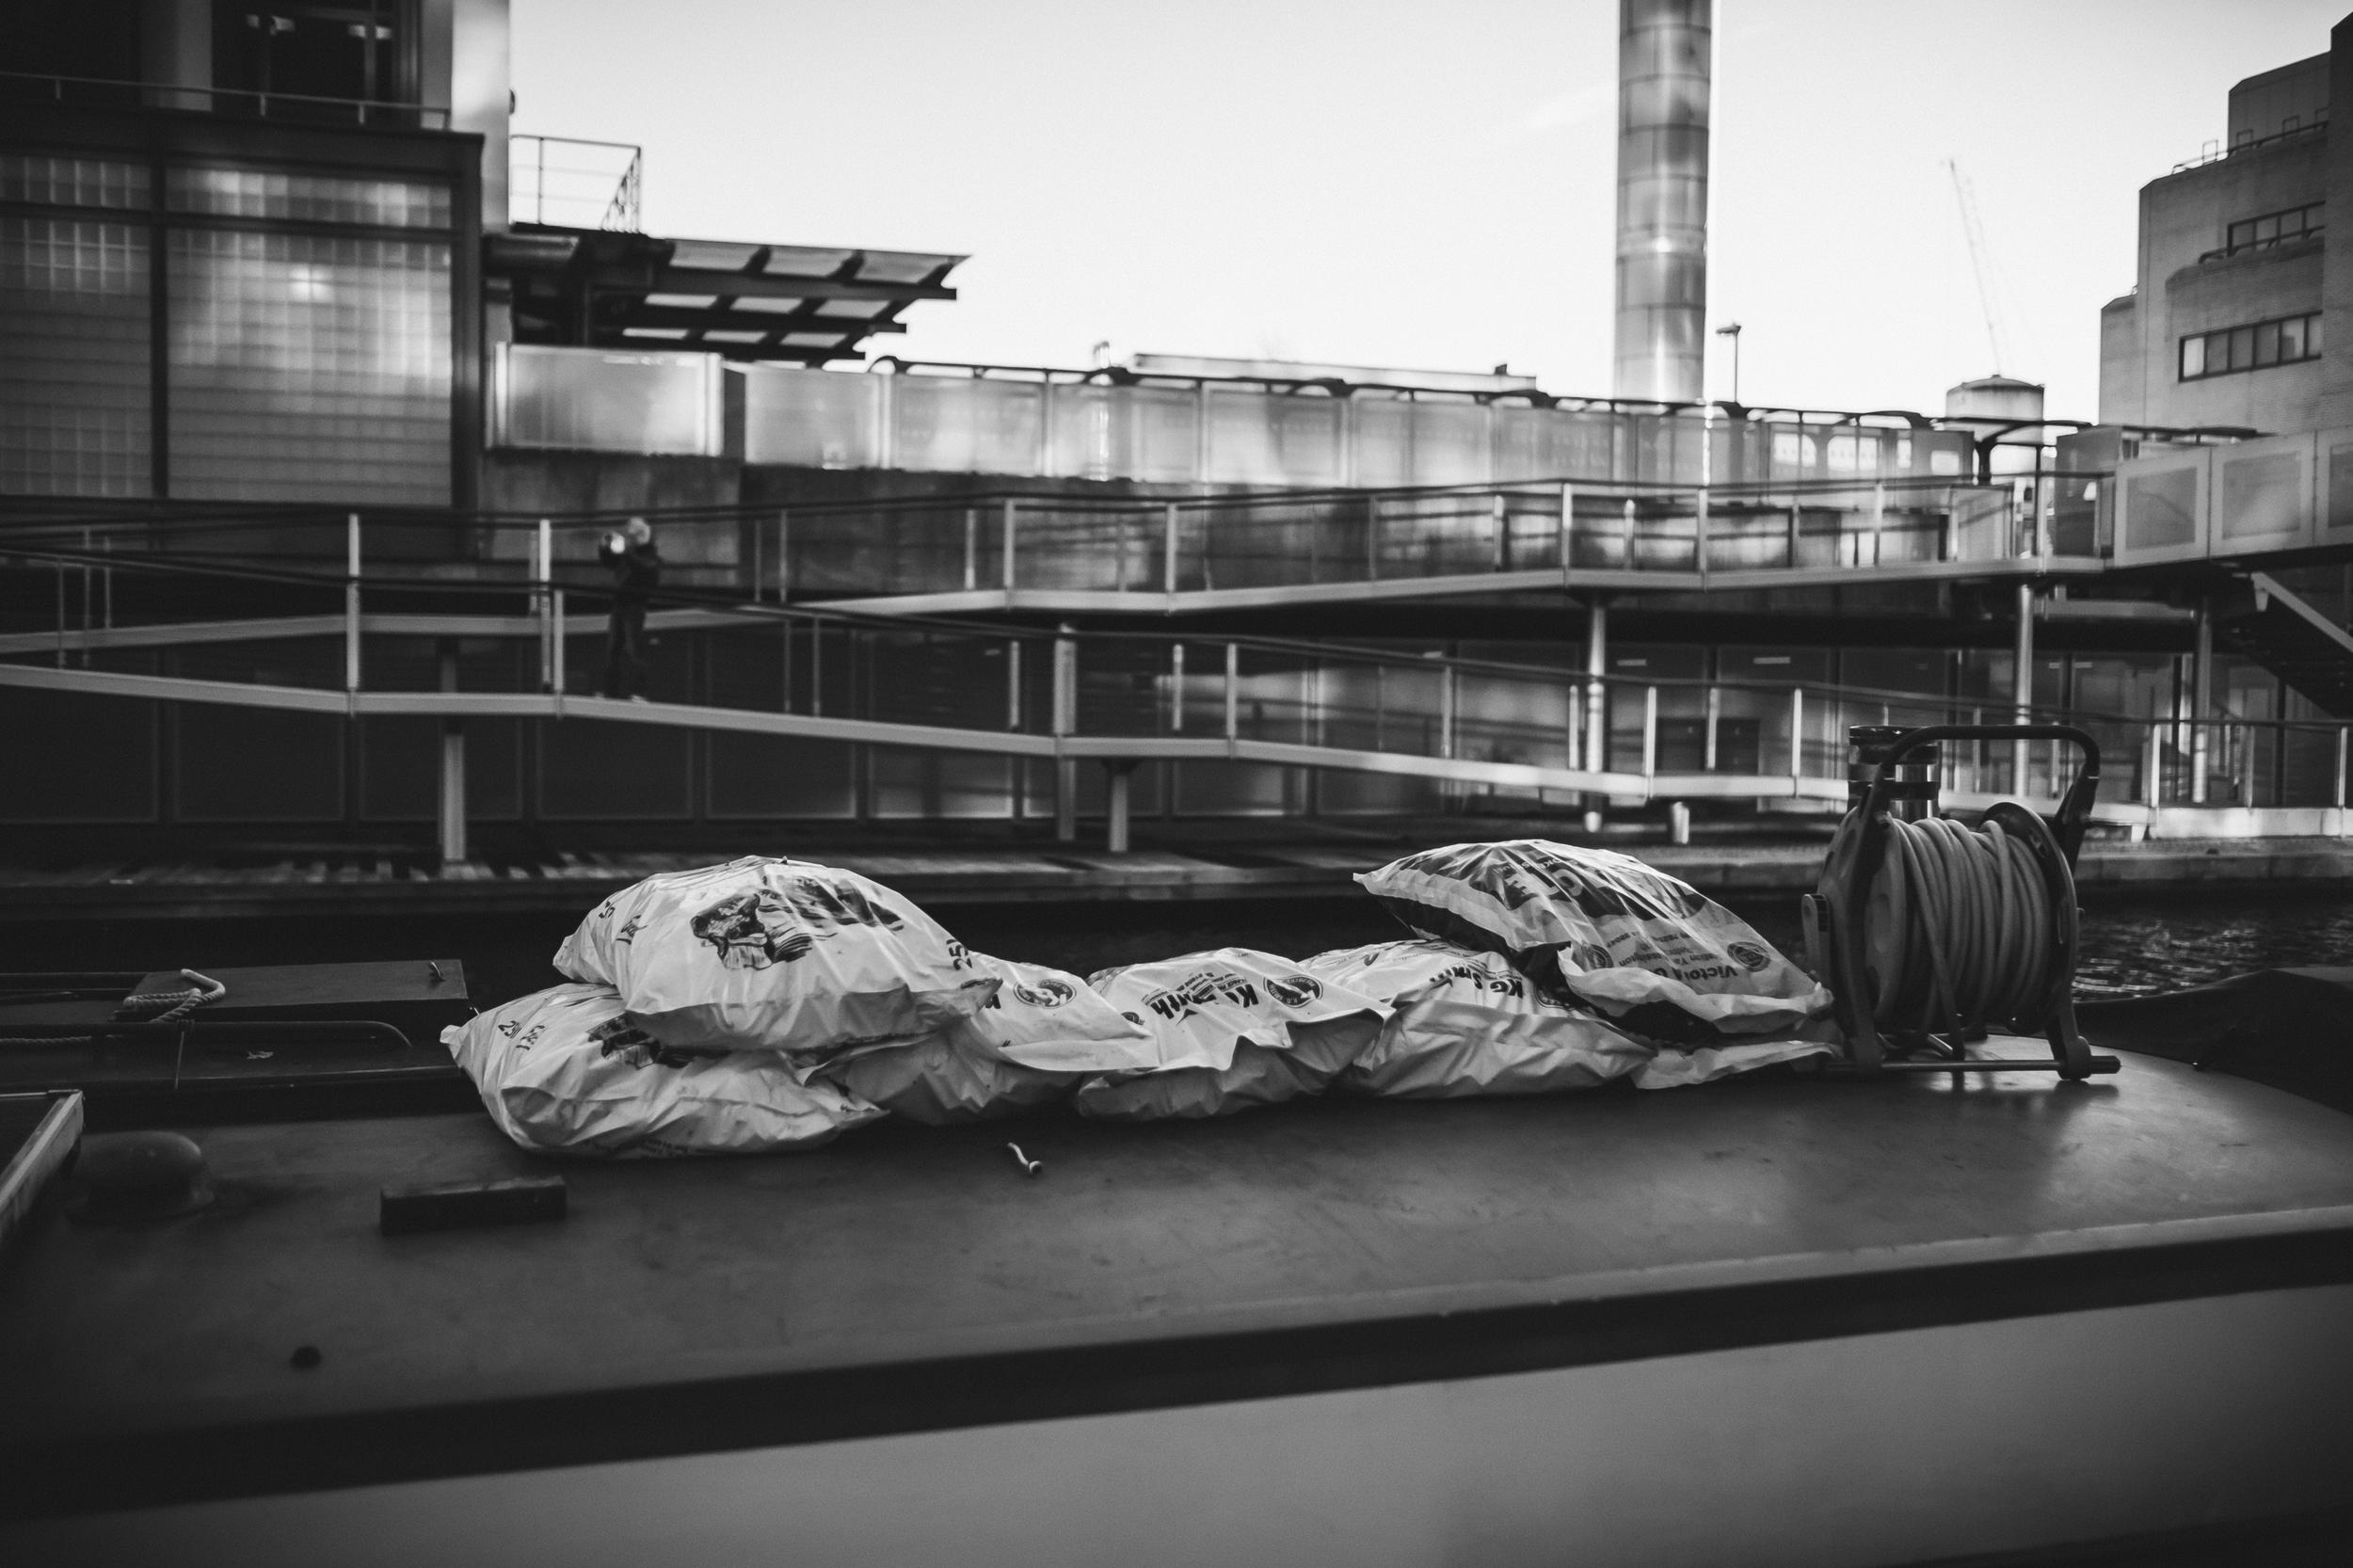 London Fuji Photowalk | Fuji XE2 | 23mm - F 1.4 - 1/4000th - iso800